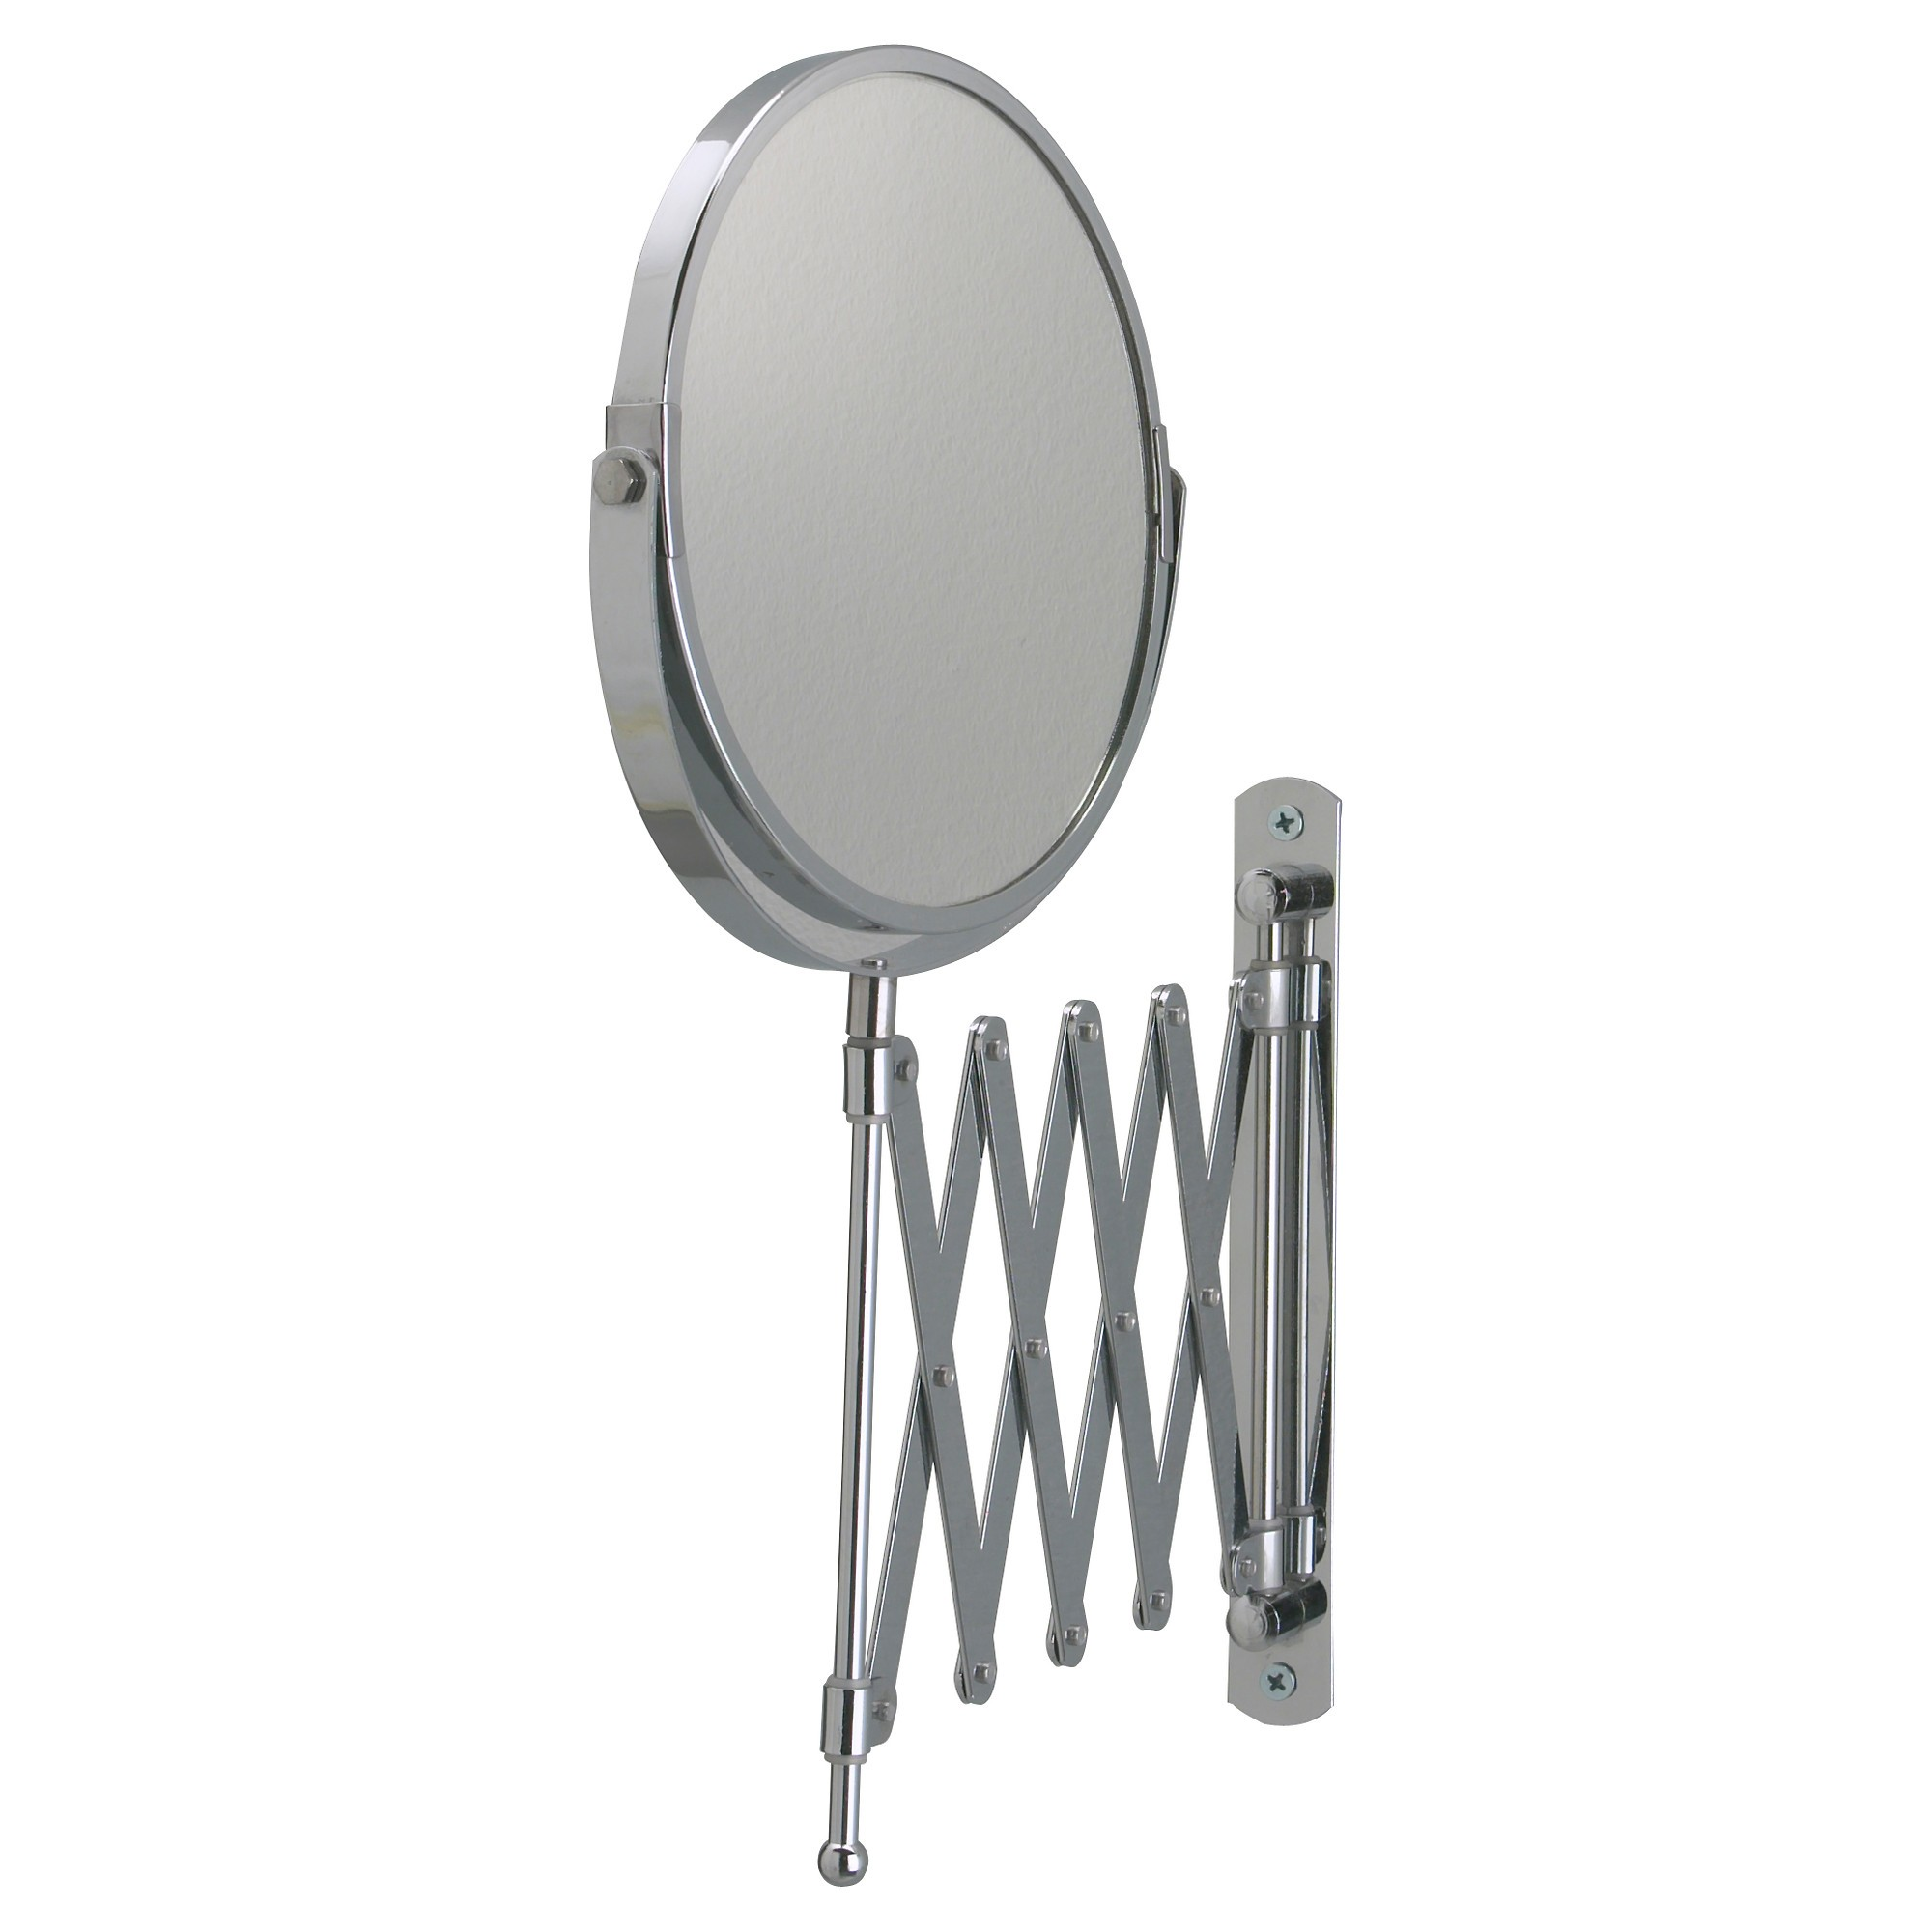 Ikea Mirrors Bathroom Contemporary Fr Ck Mirror Pattern